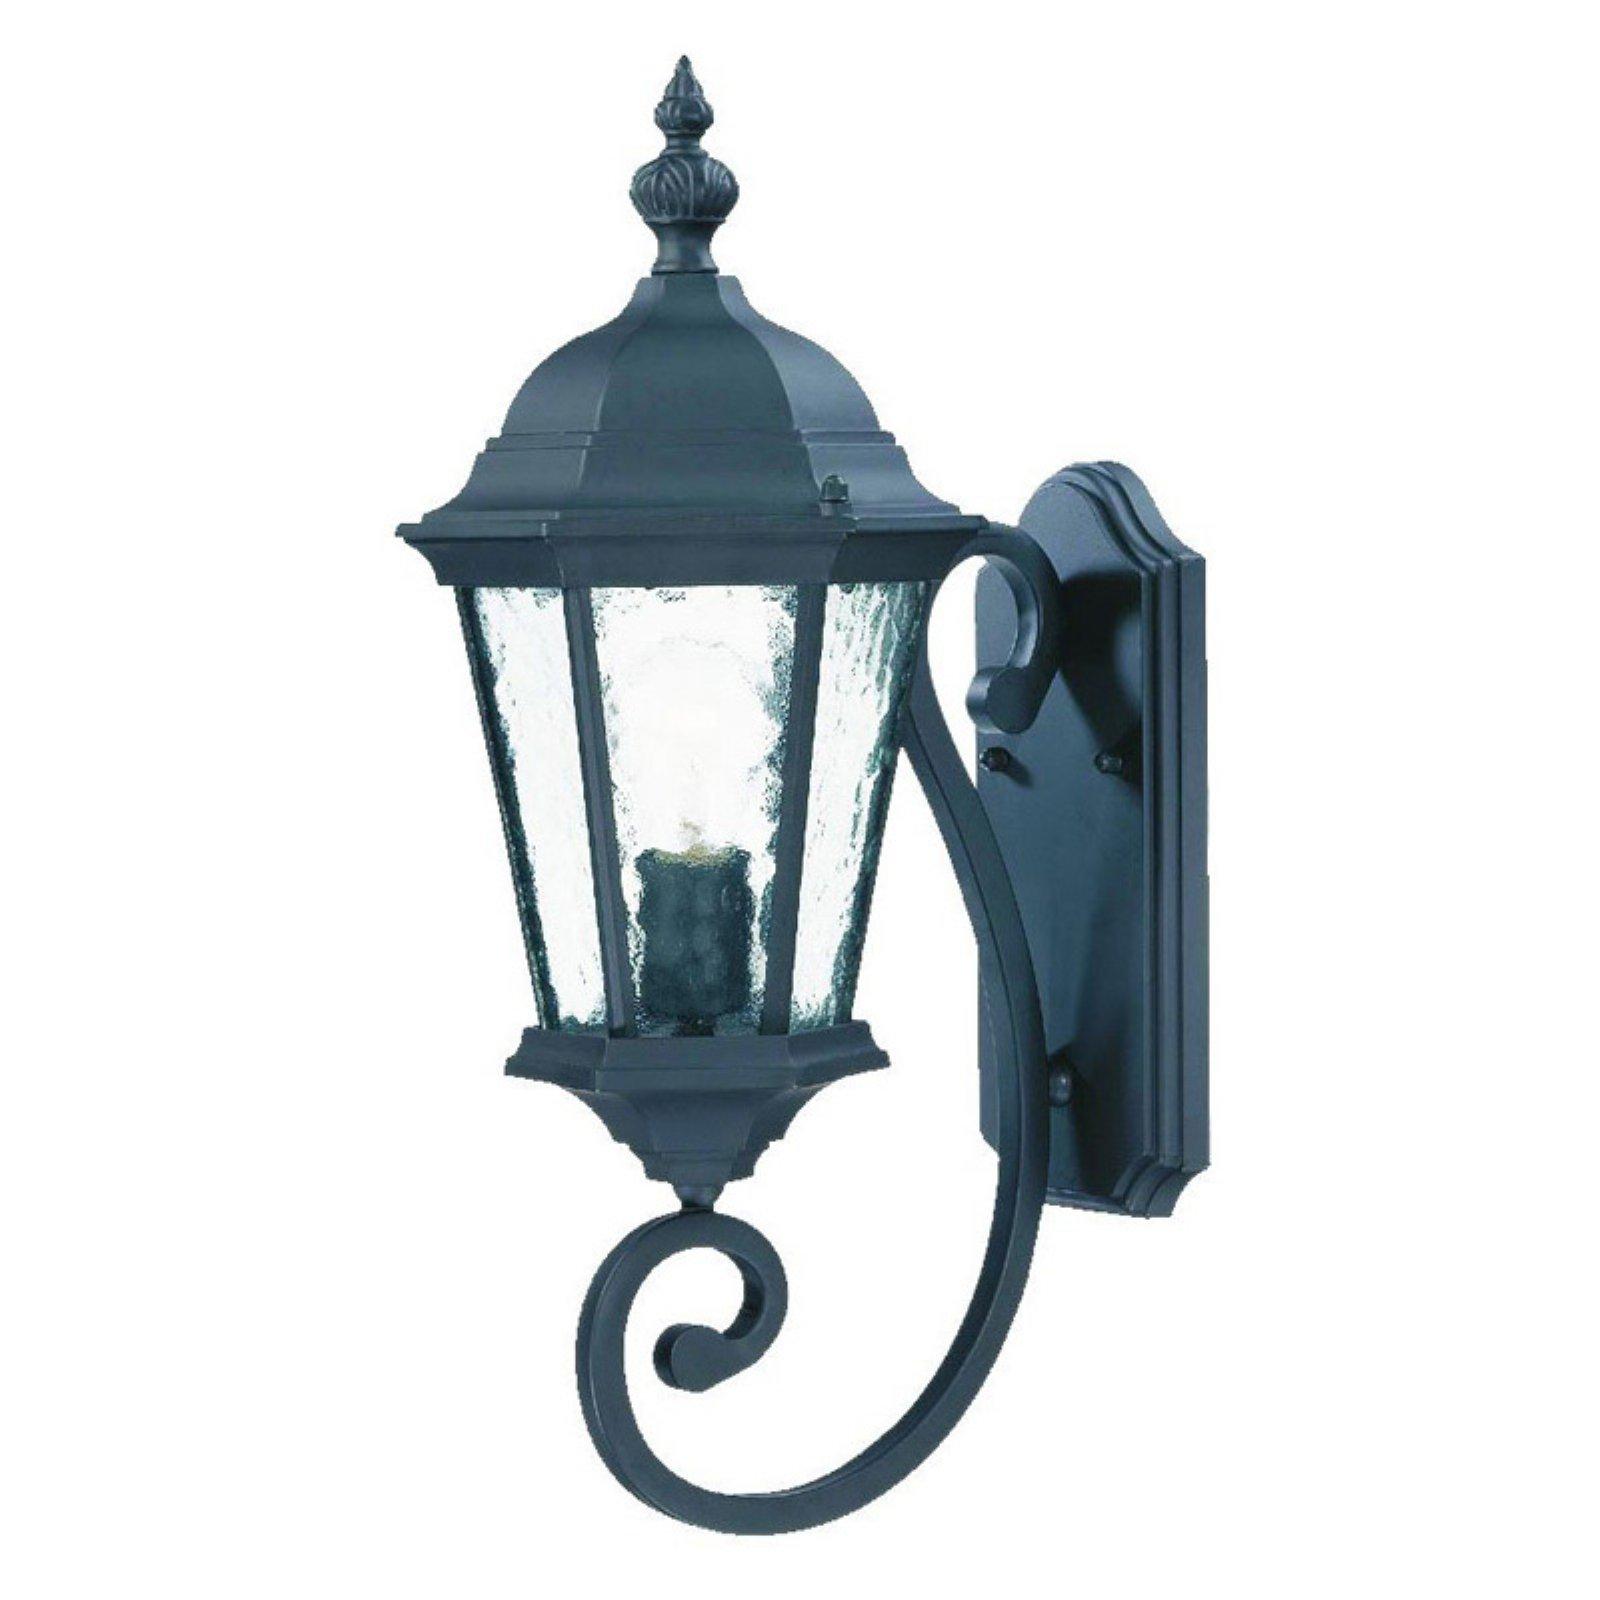 Acclaim Lighting Telfair Outdoor Wall Mount Light Fixture